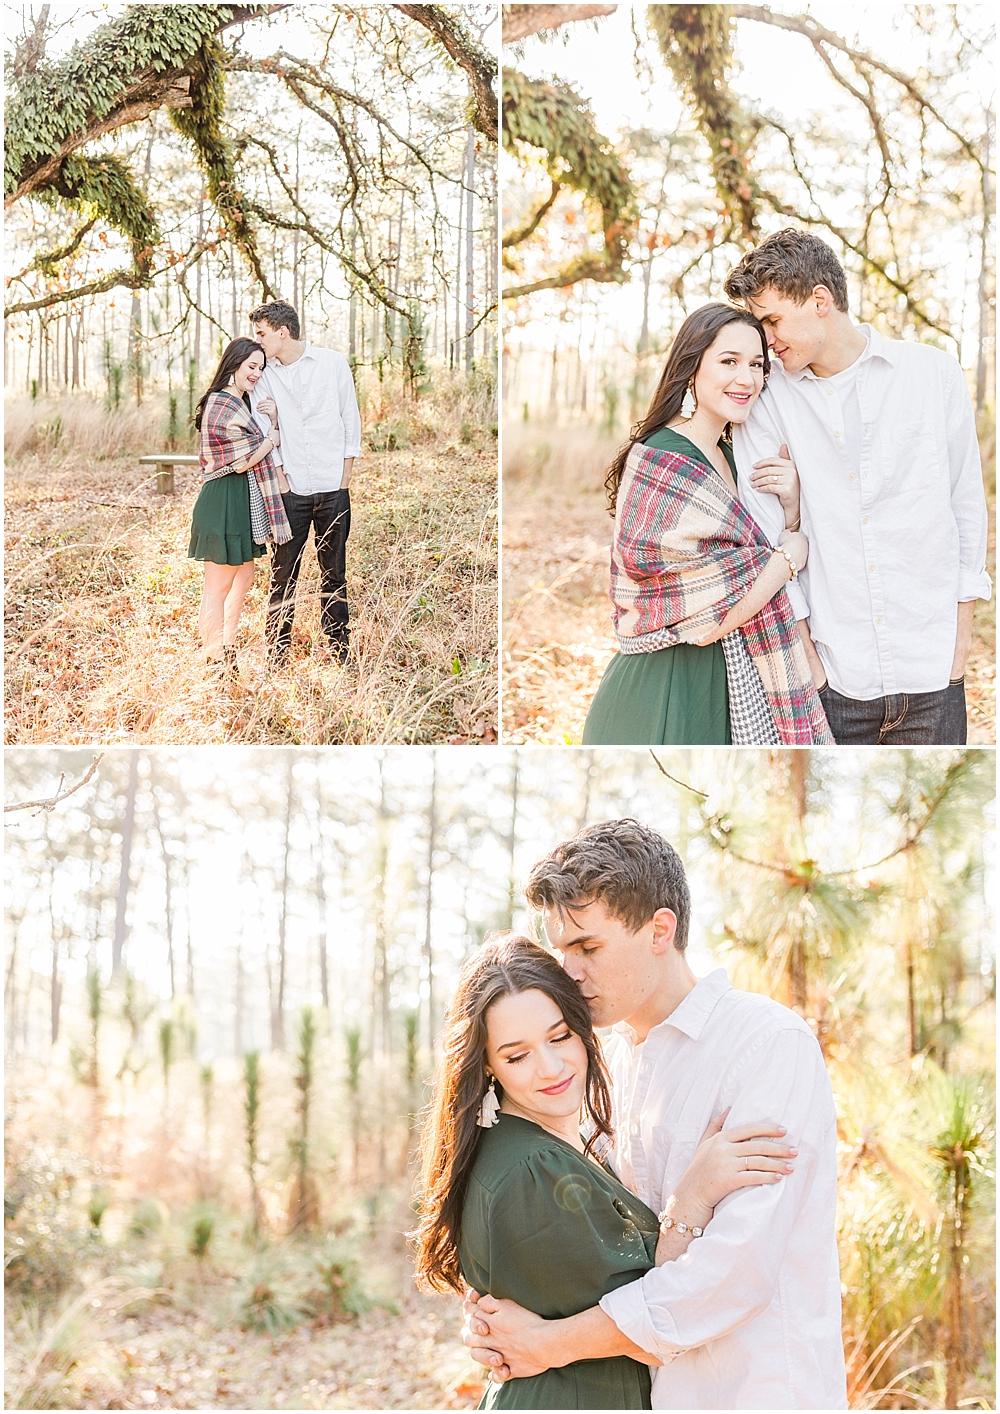 Ashton-Clark-Photography-Wedding-Portrait-Family-Photographer-Mobile-Alabama_0383.jpg